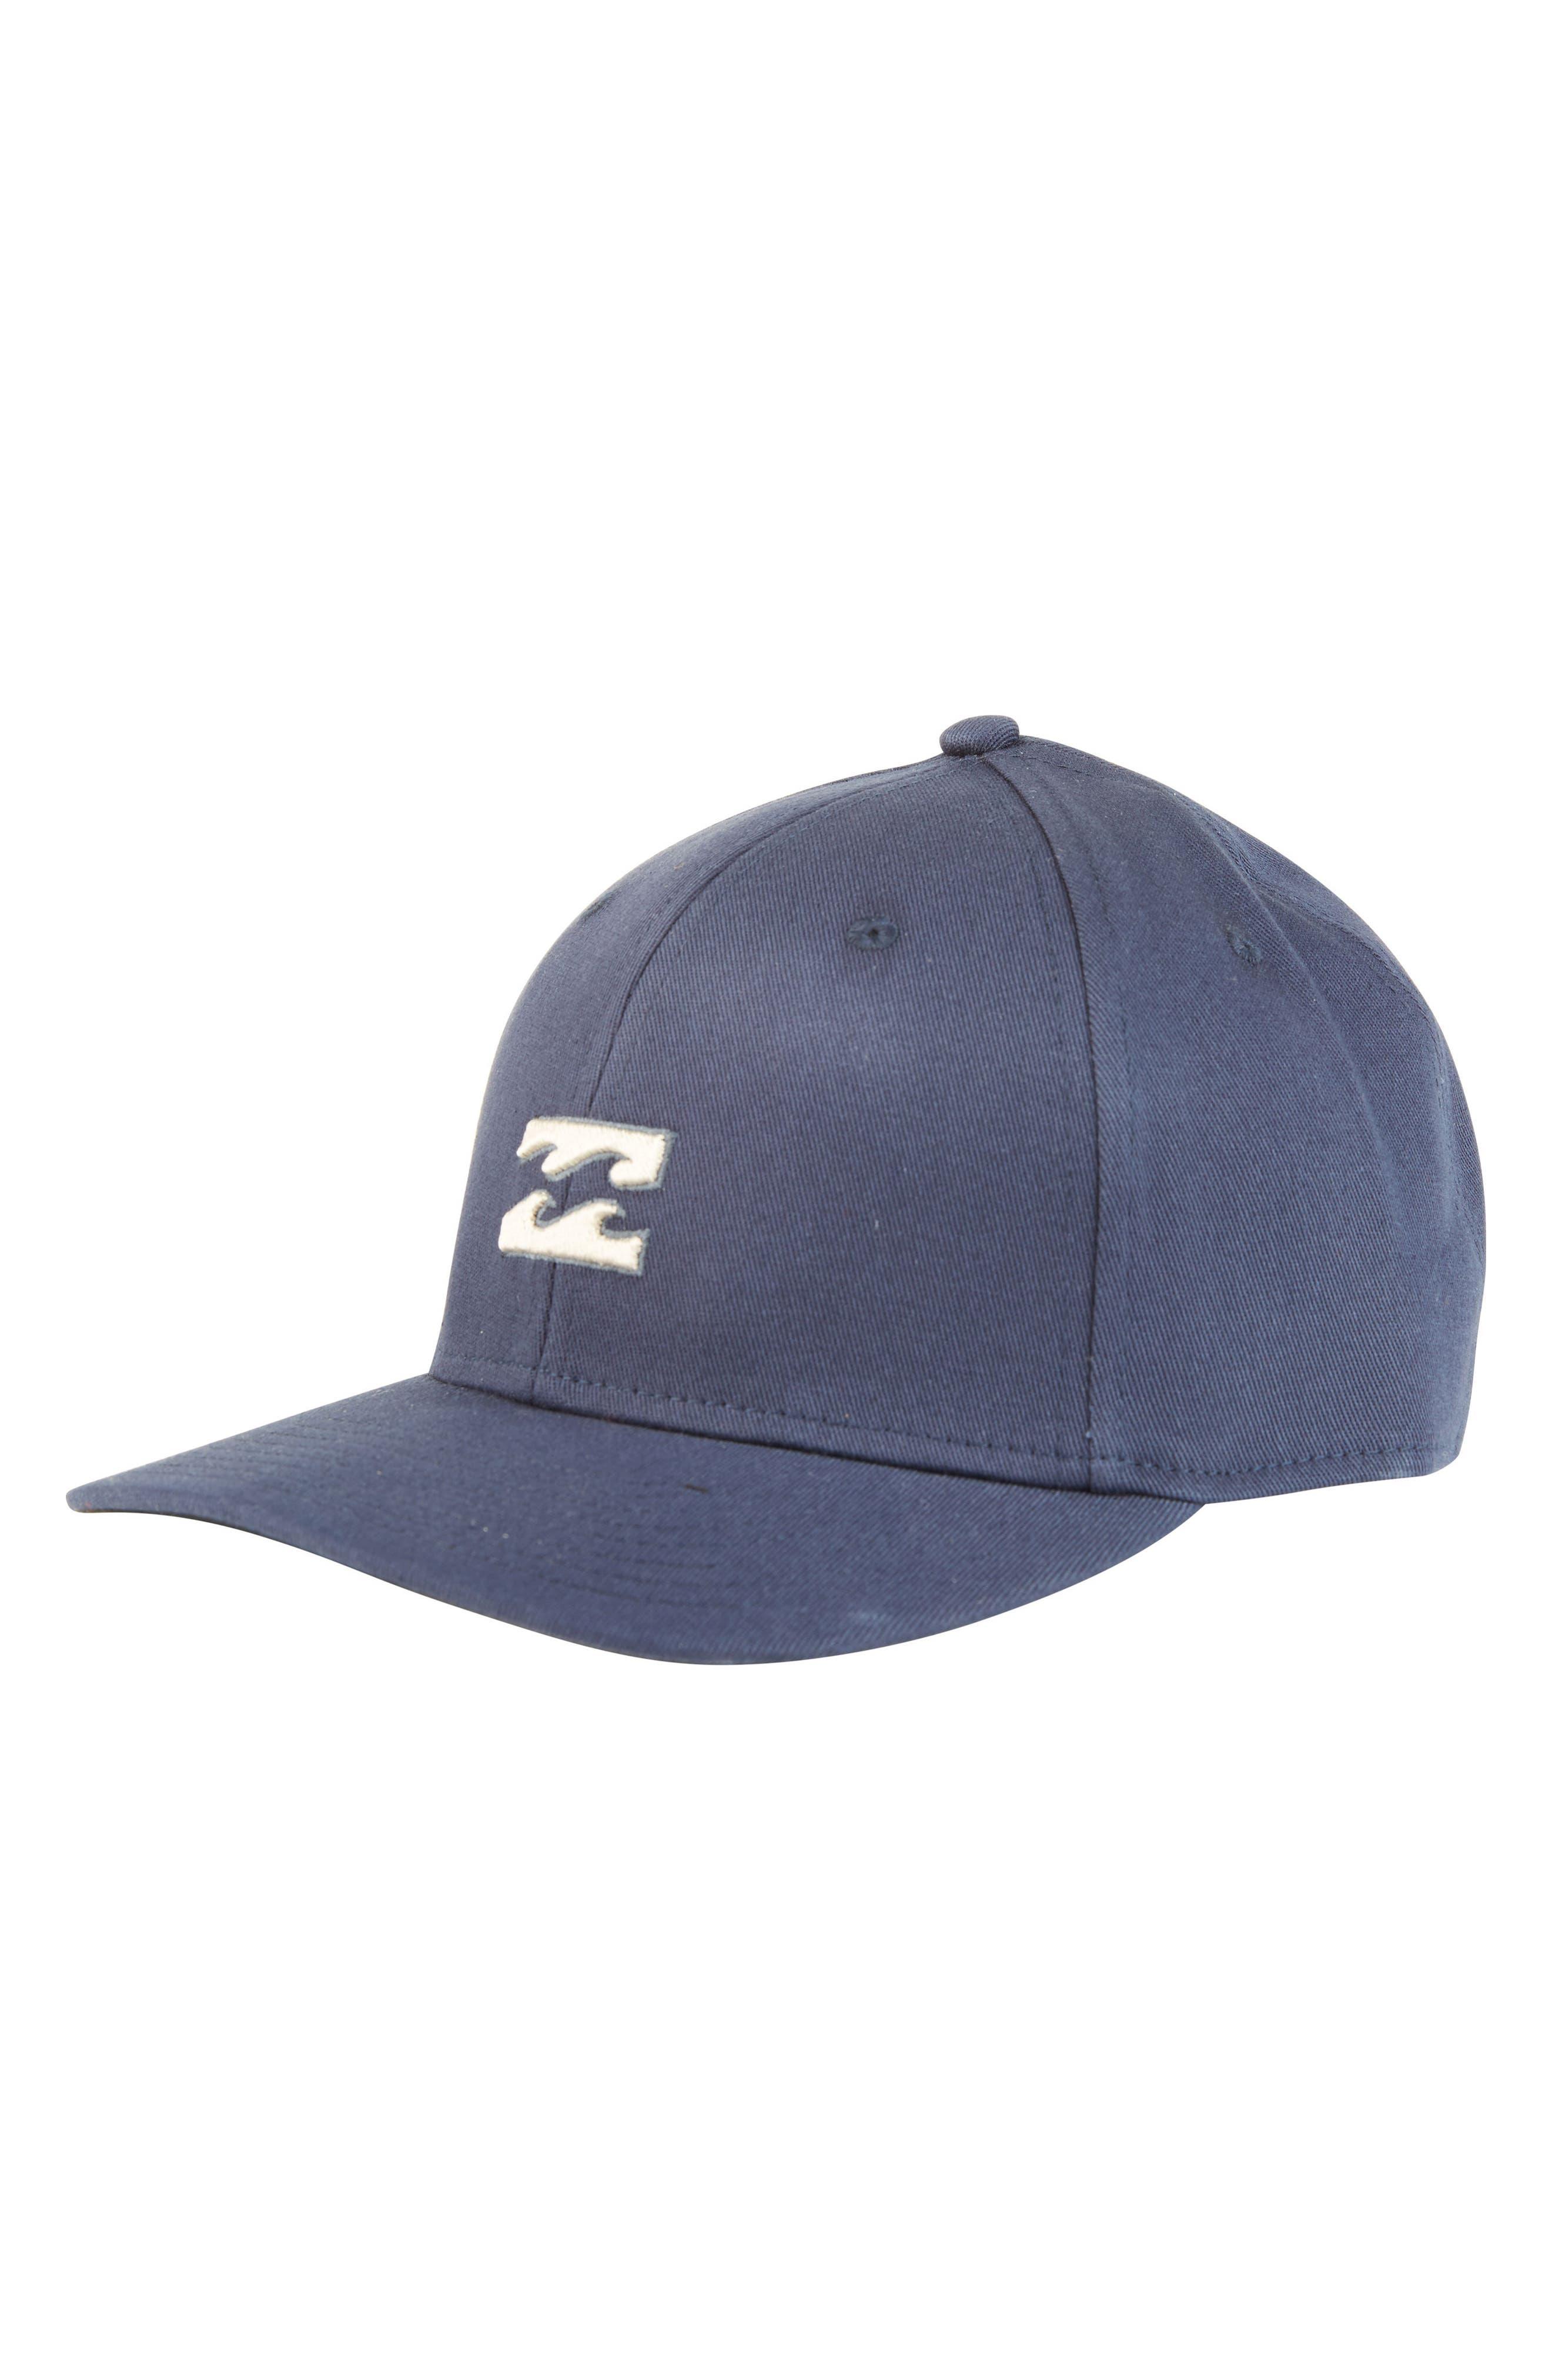 Alternate Image 1 Selected - Billabong All Day Stretch Baseball Cap